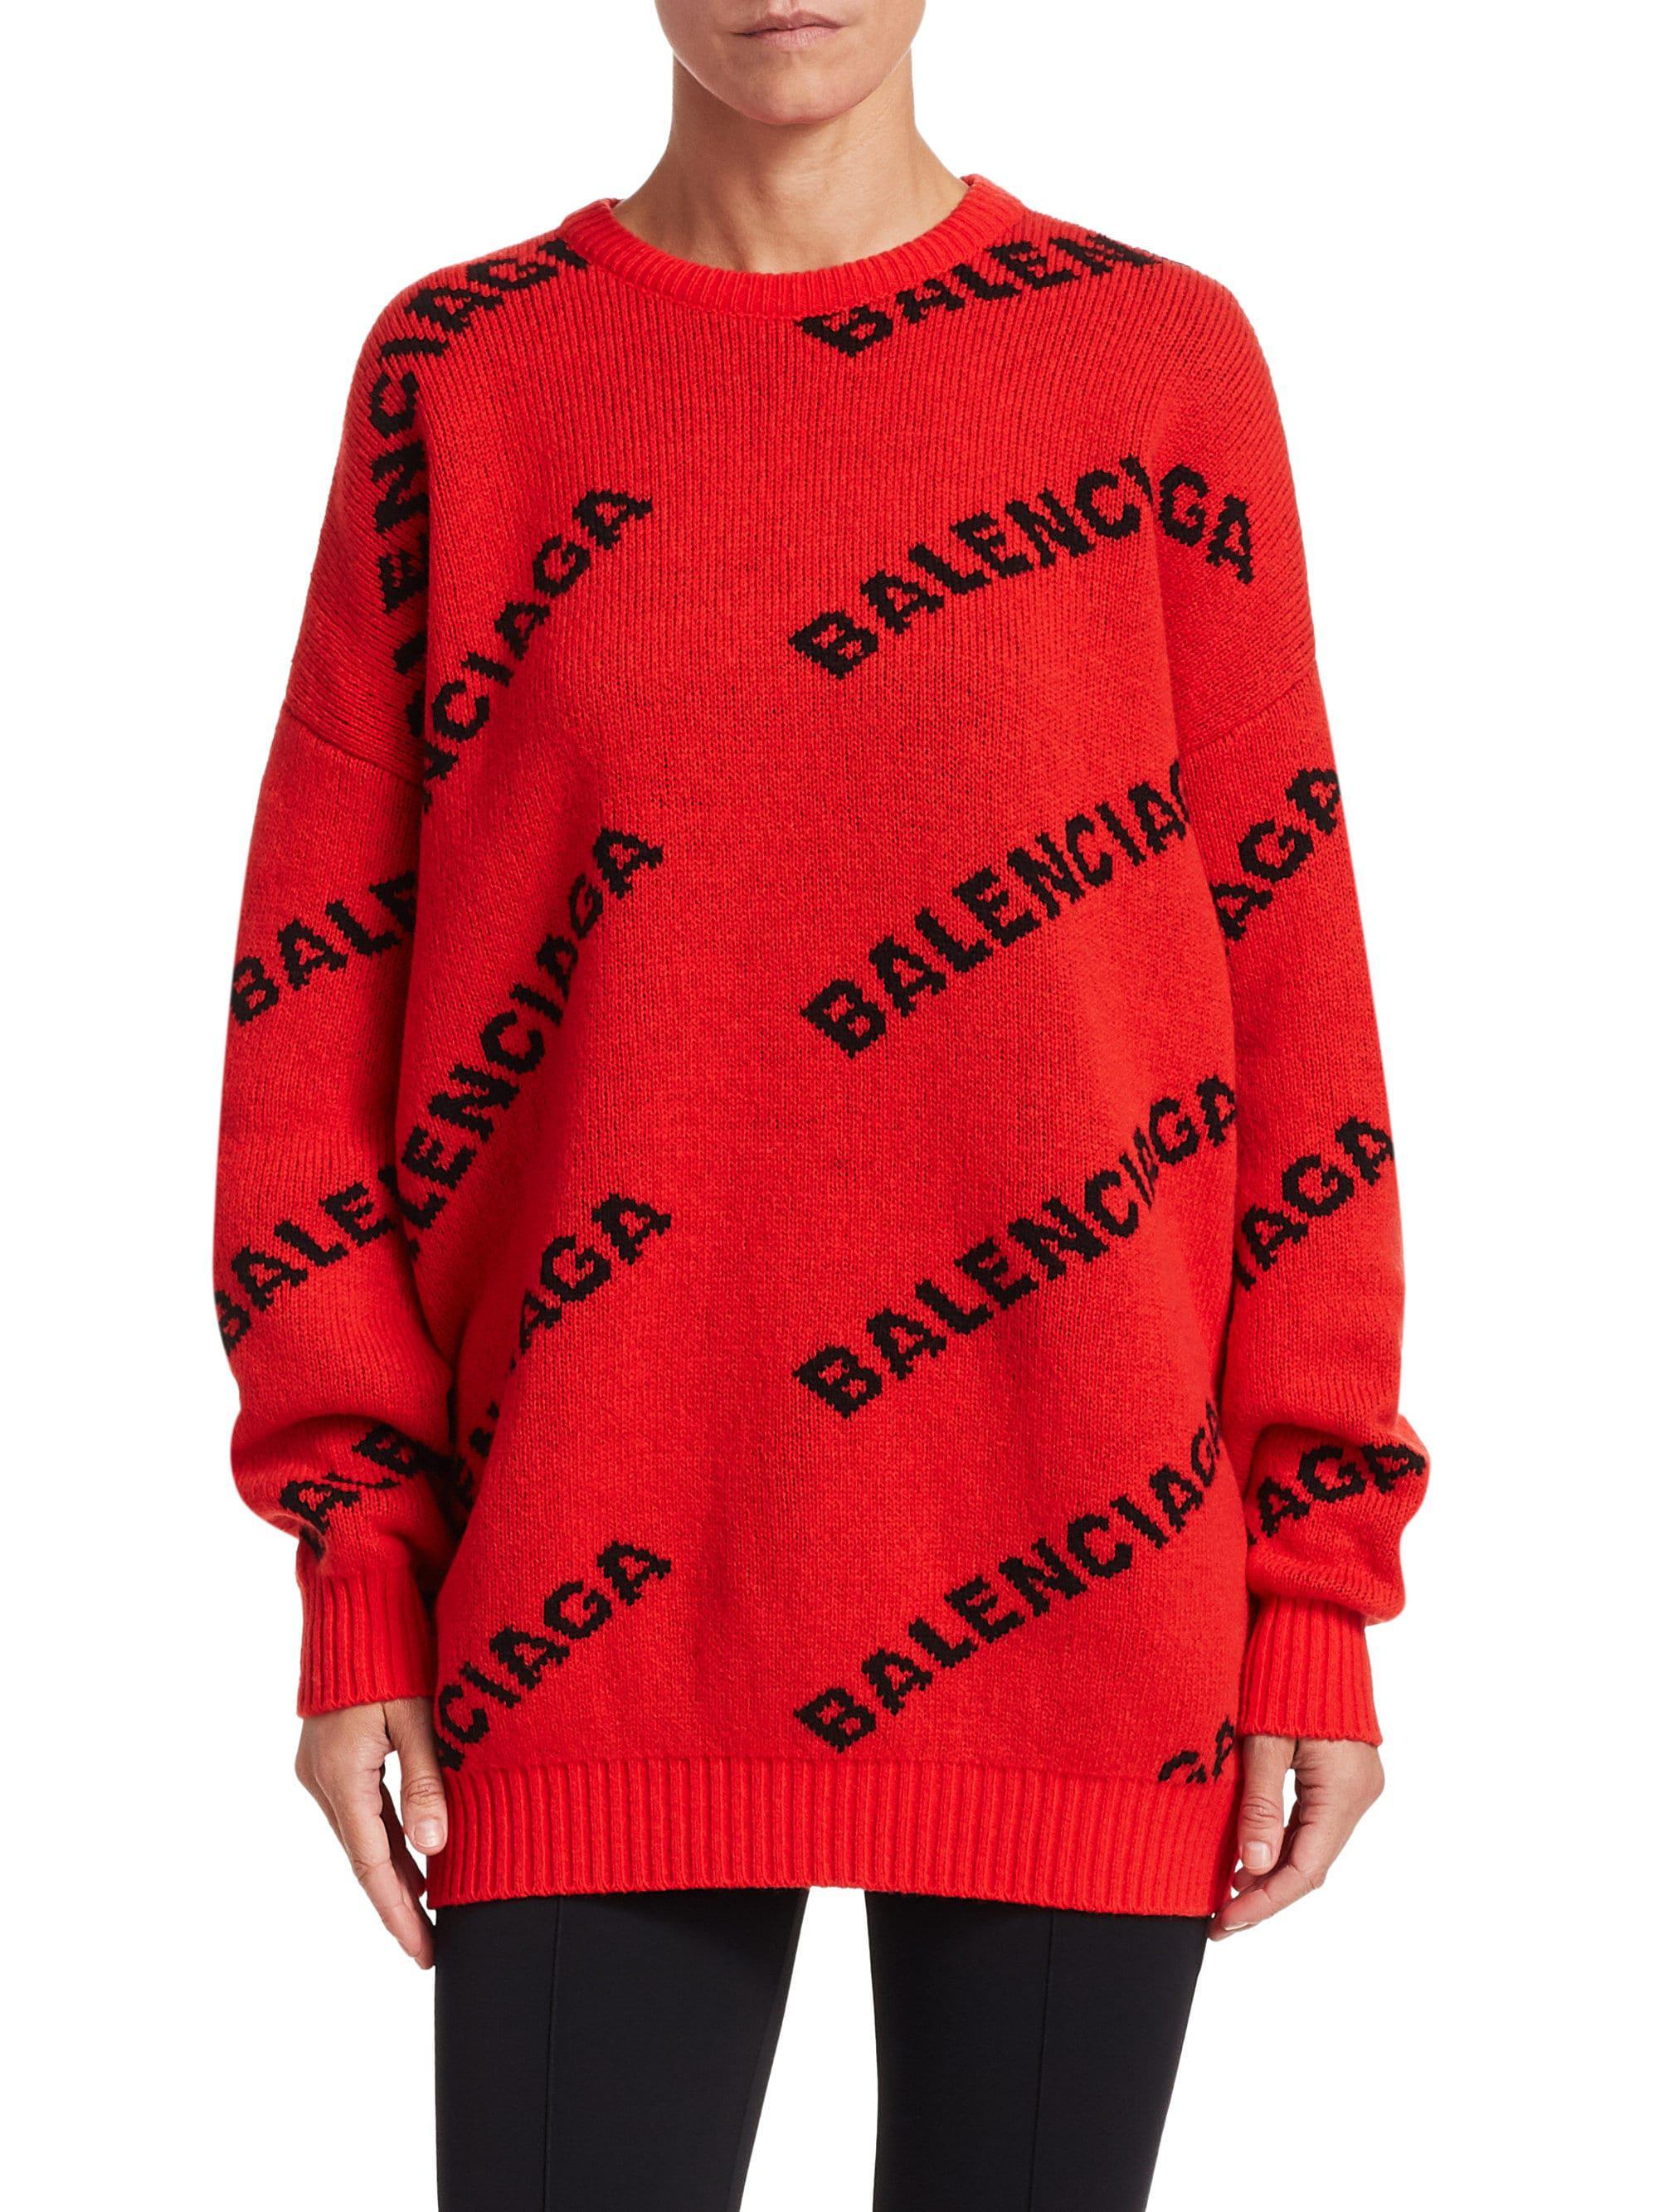 Balenciaga - Red Wool-blend Logo Sweater - Lyst. View fullscreen 6500c707b